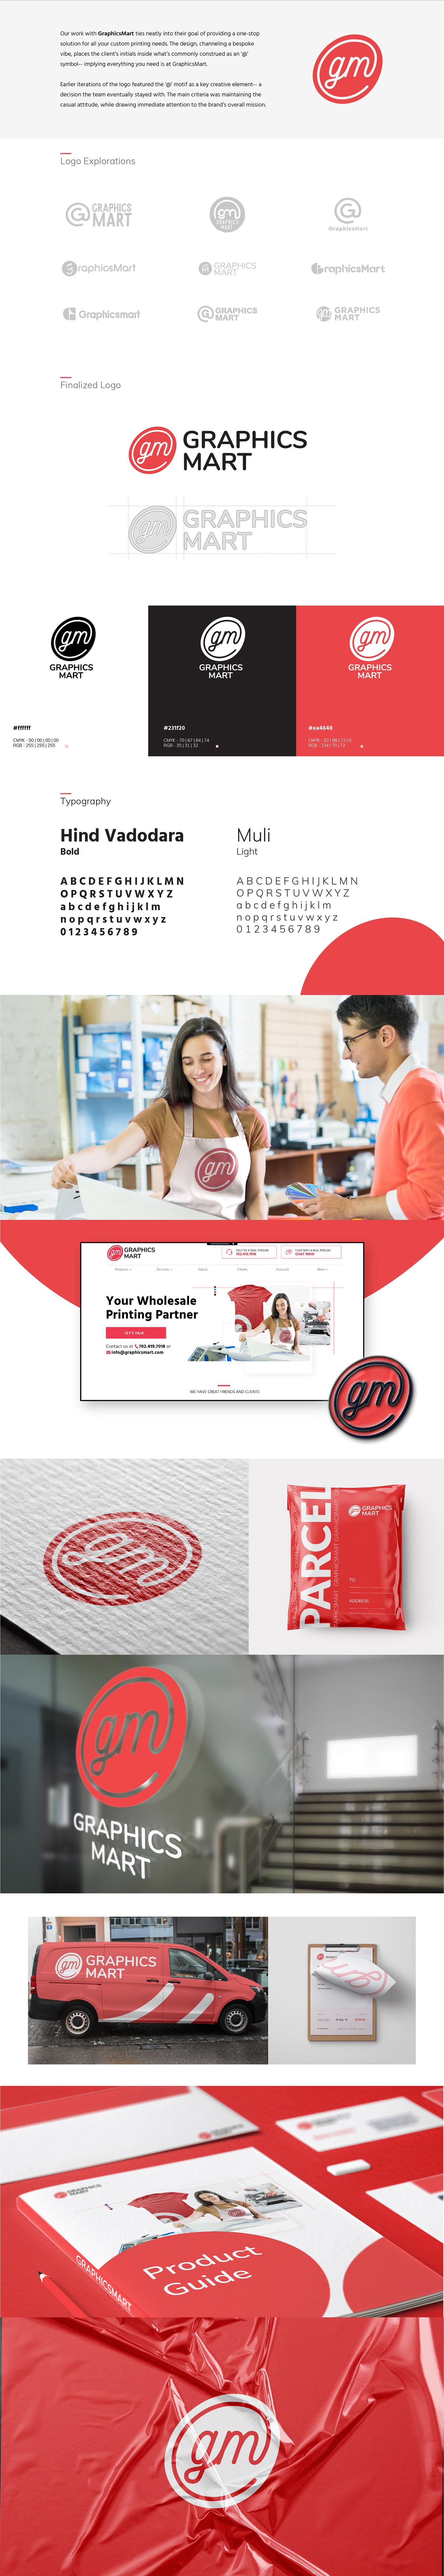 brand identity branding  creative studio fix creatives Logo Design Manila Printing service